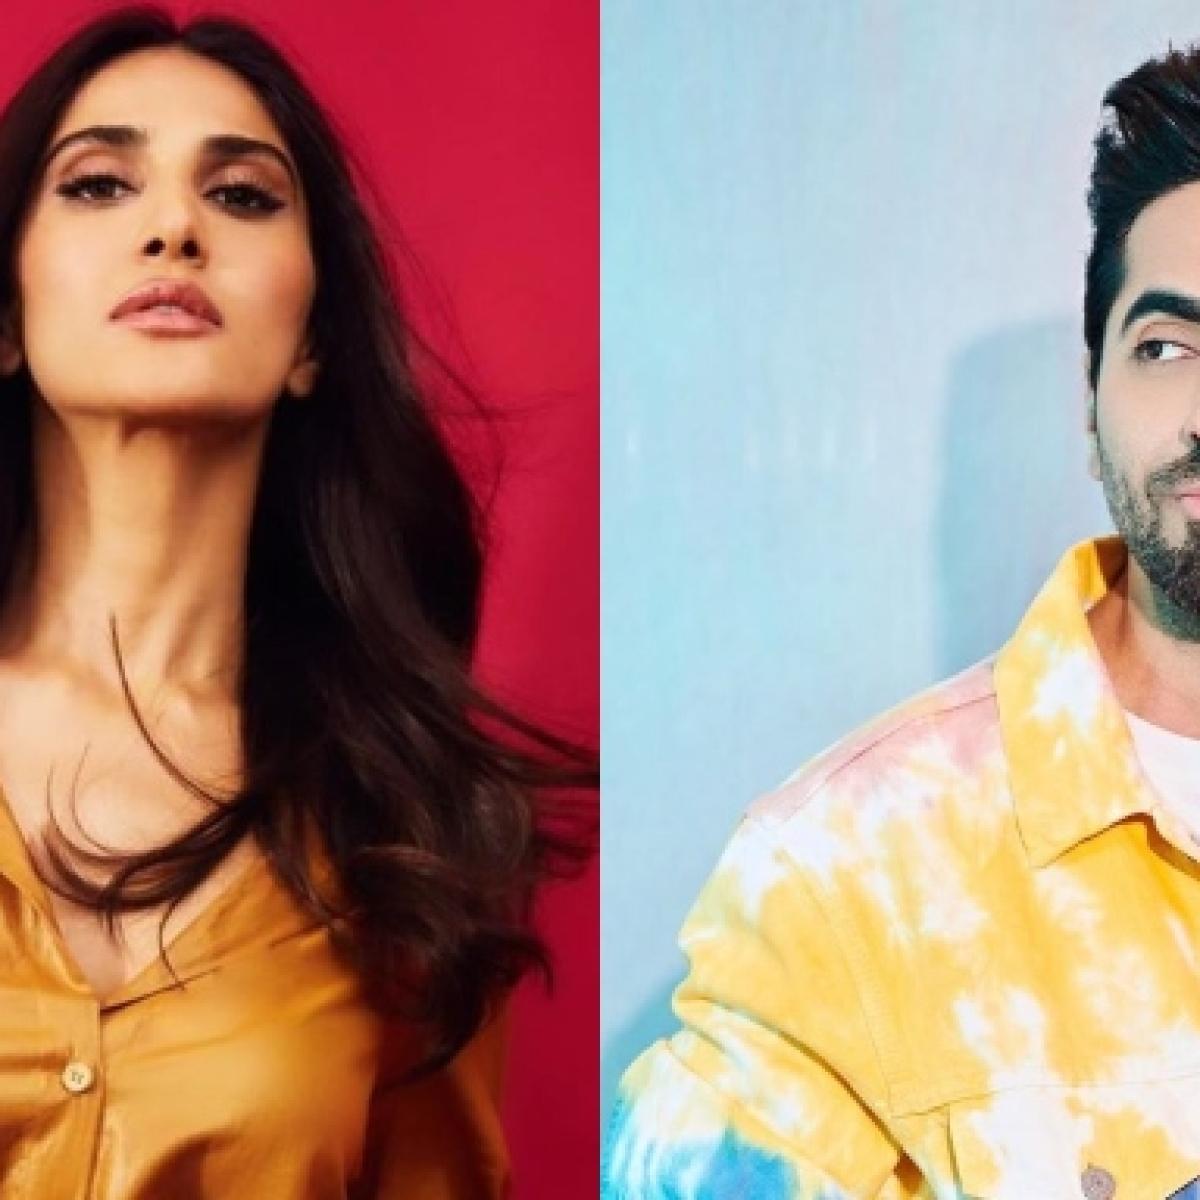 Vaani Kapoor heads Chandigarh for next project opposite Ayushmann Khurrana